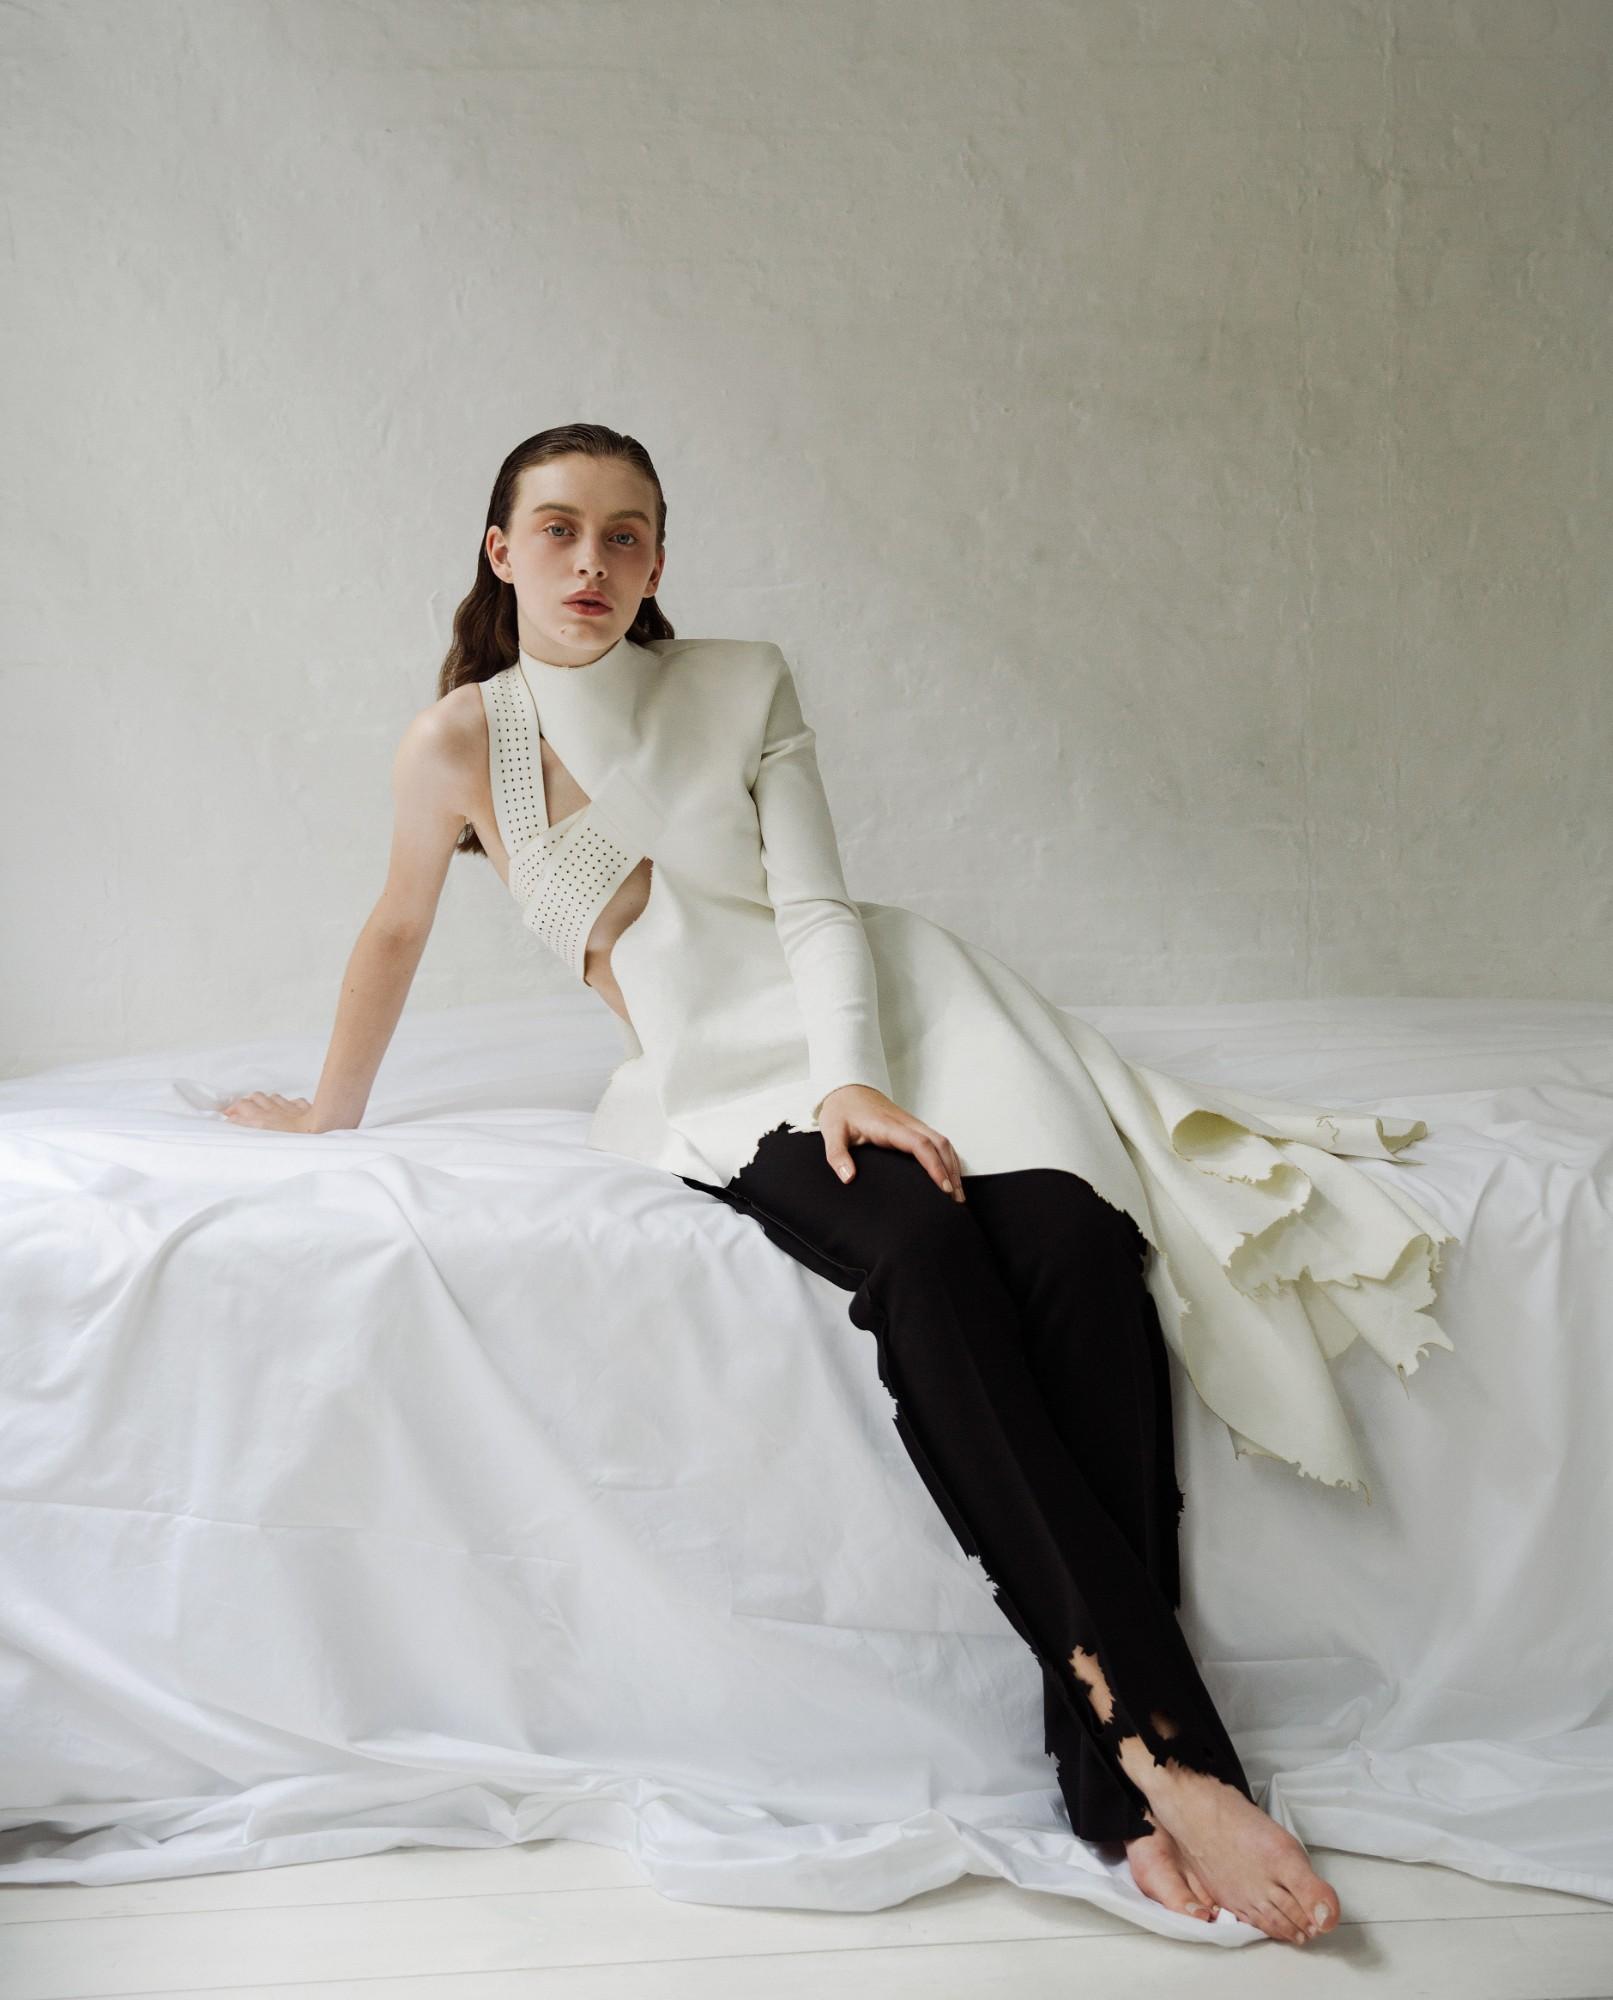 Vulnus Cura, Yvonne Lin, designer, Courtesy of Yvonne Lin, 19_1